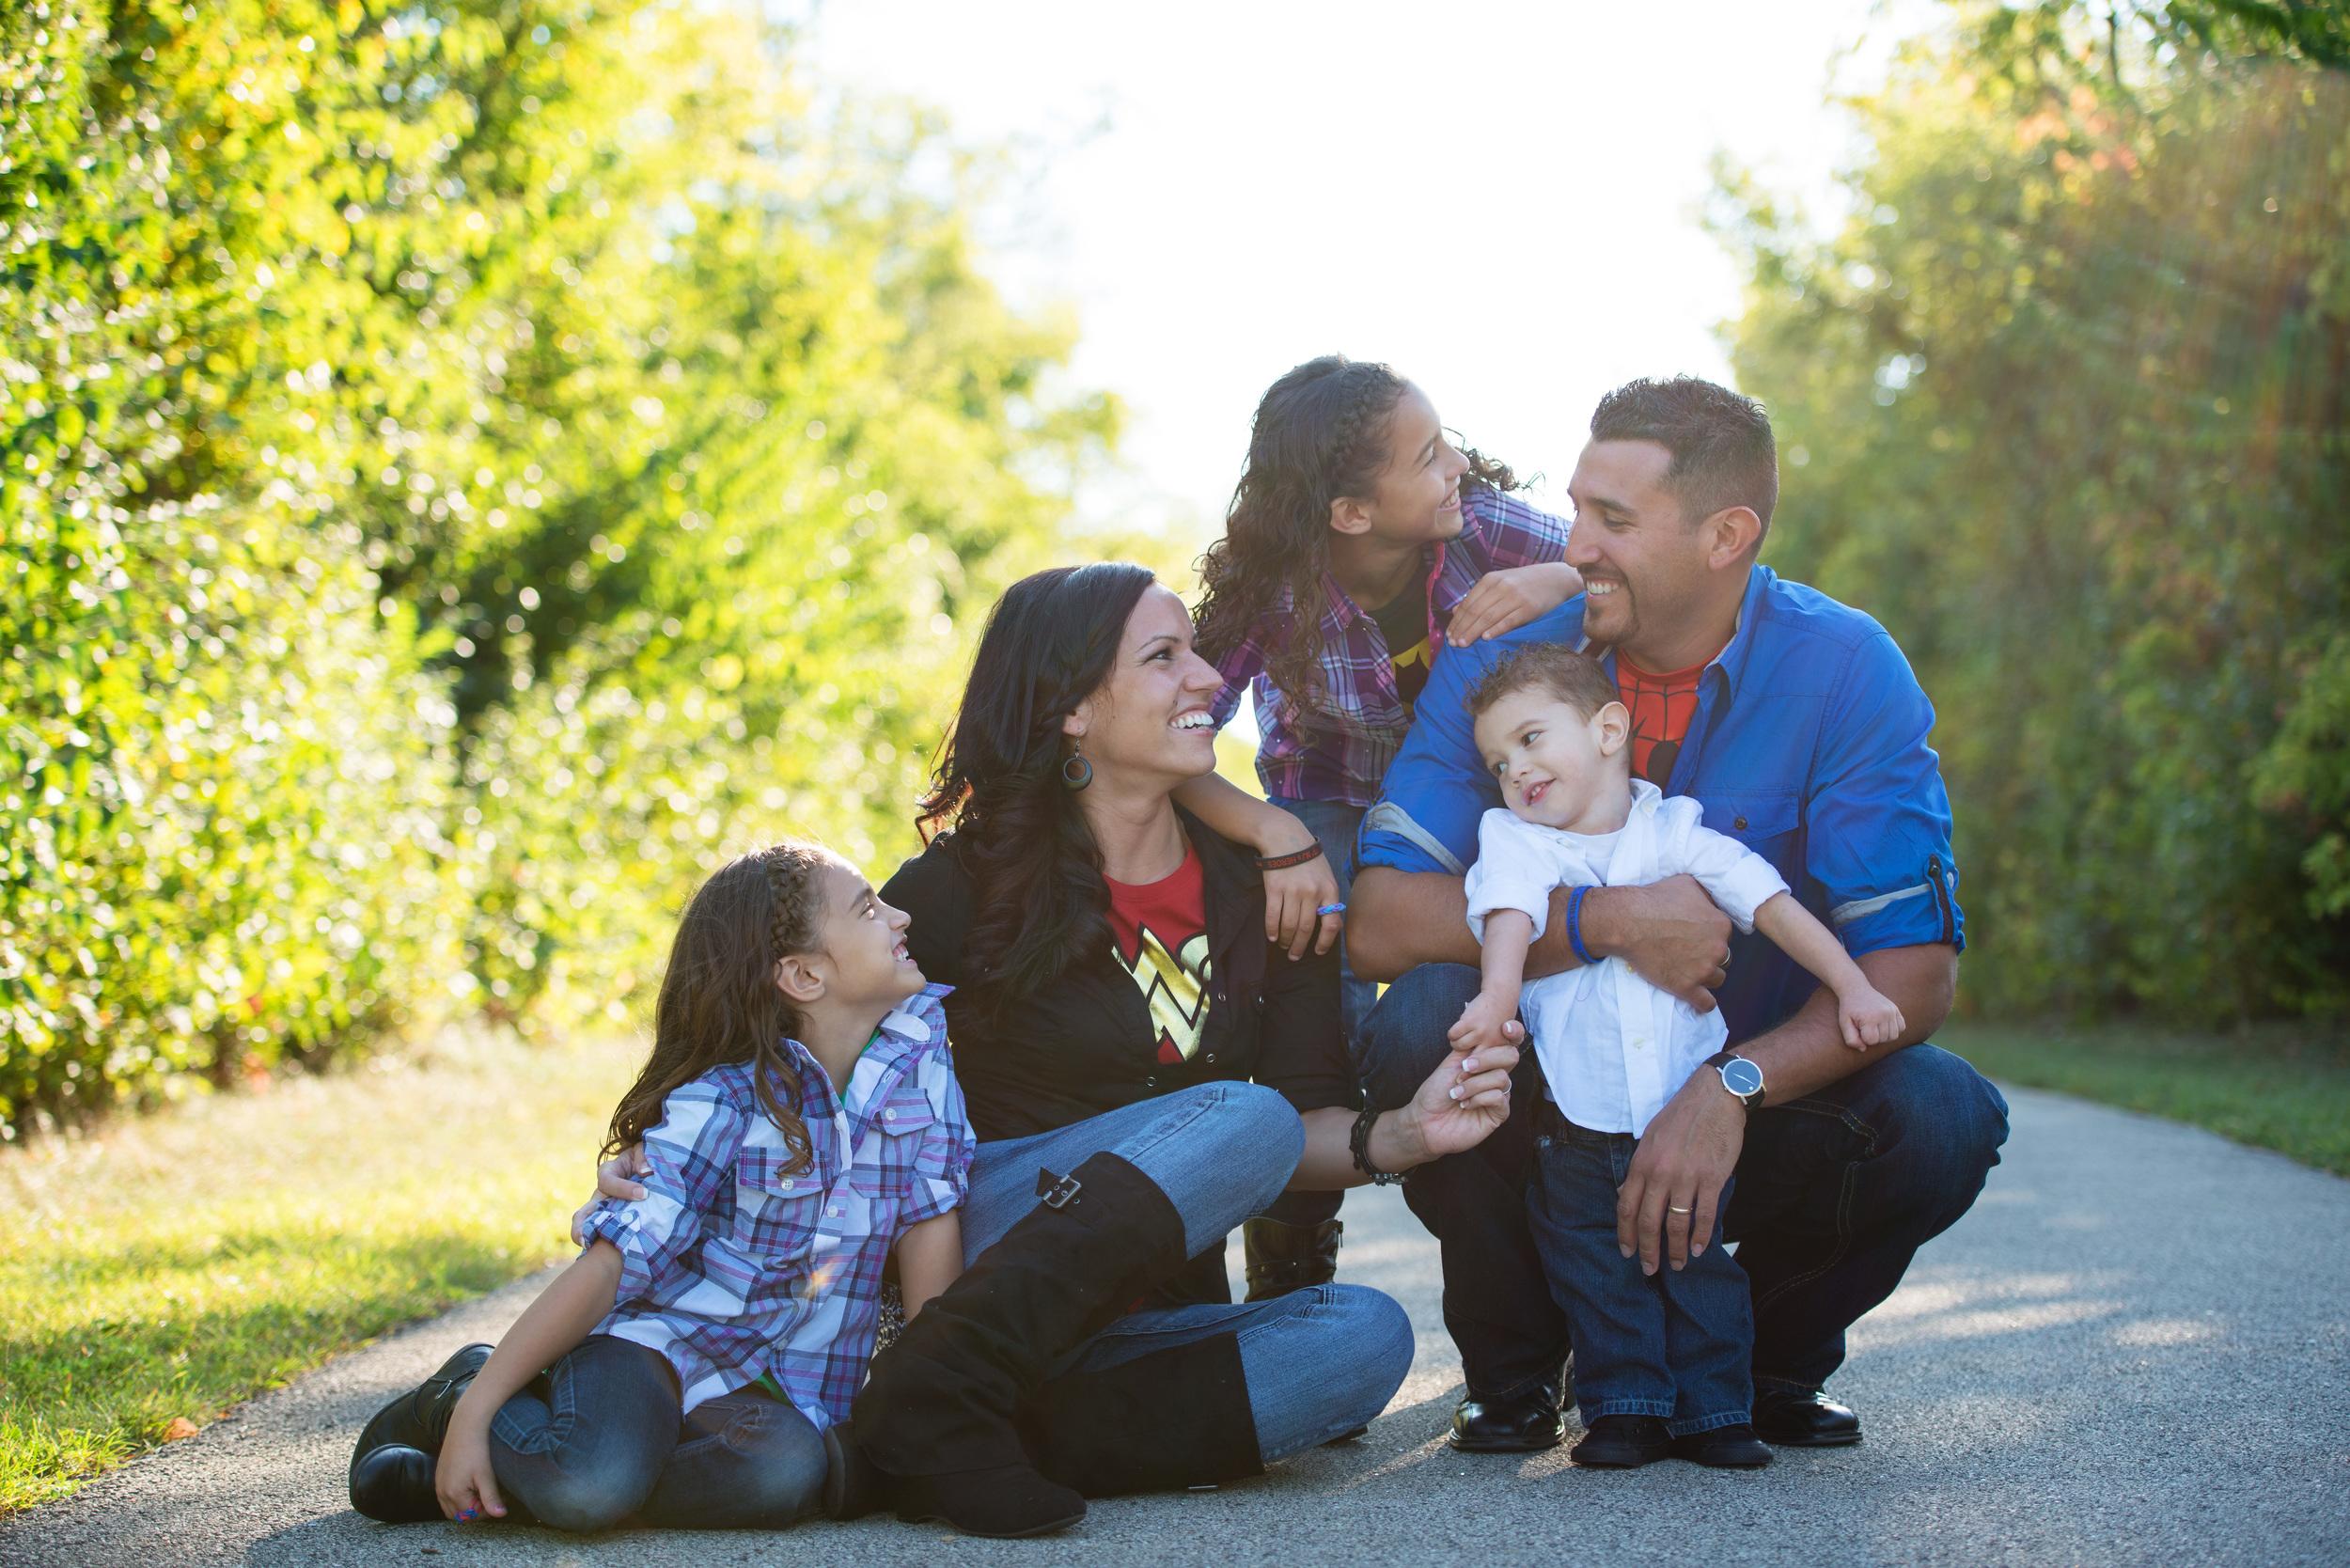 20130922-The Bueno Family-PrintEdit-018.jpg